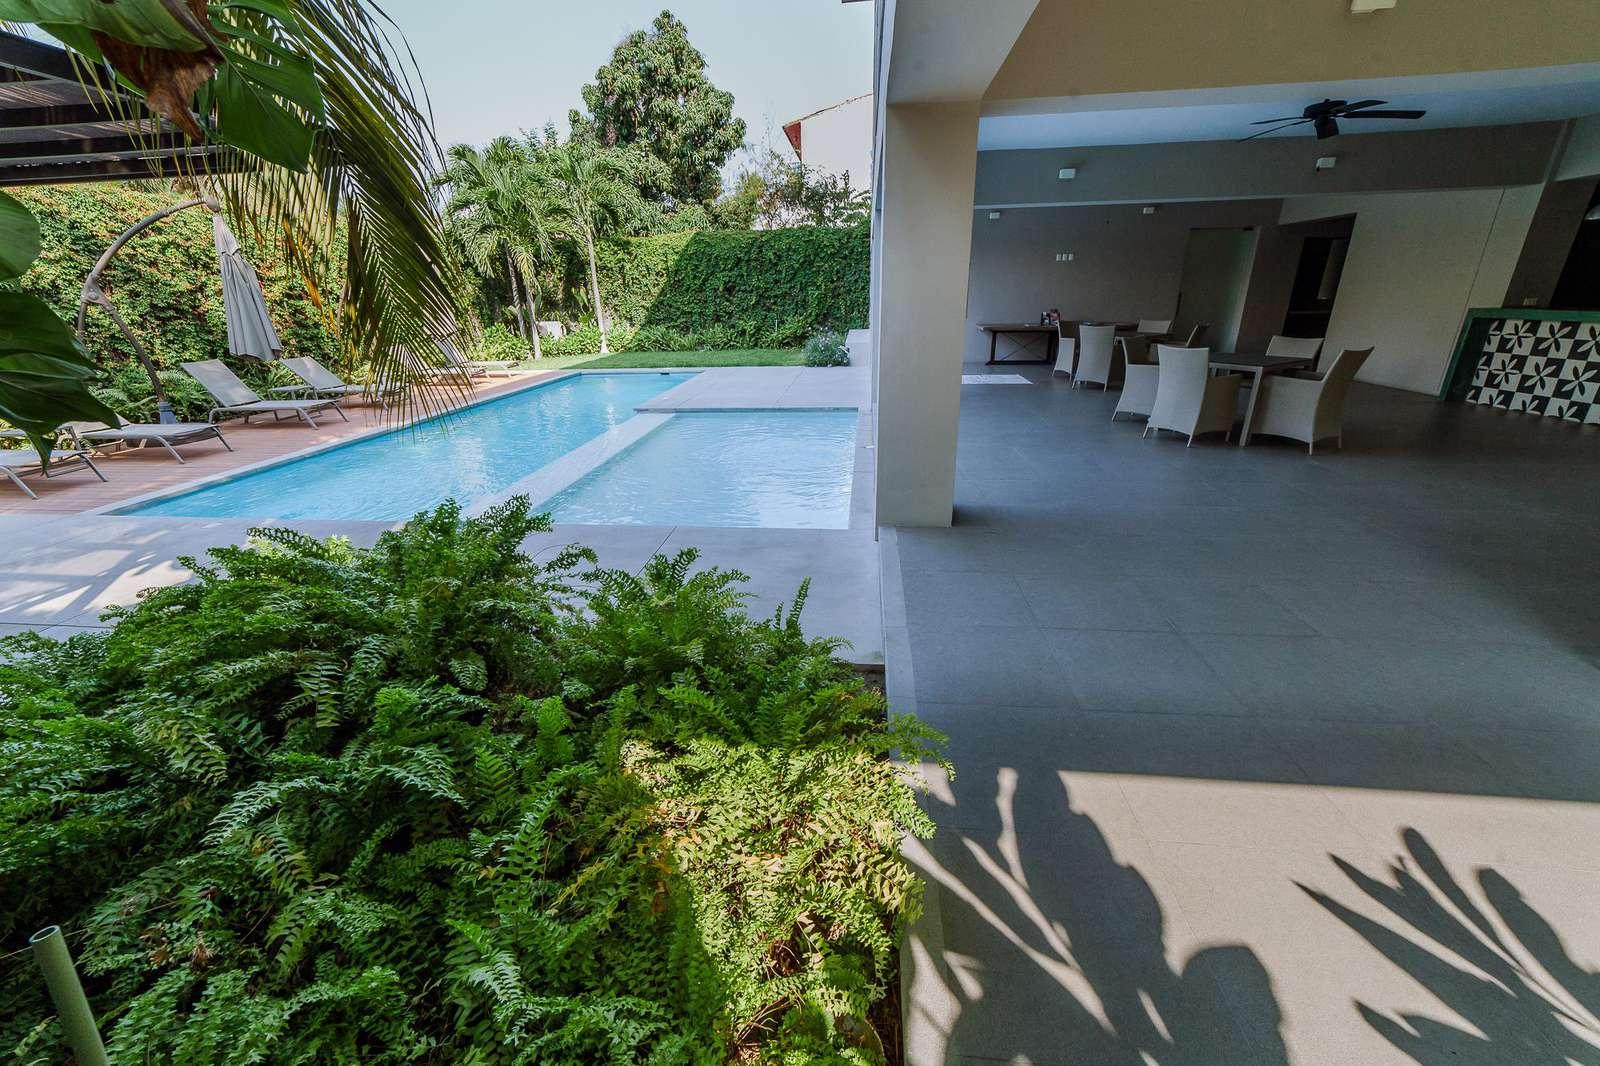 Spacious pool & common area